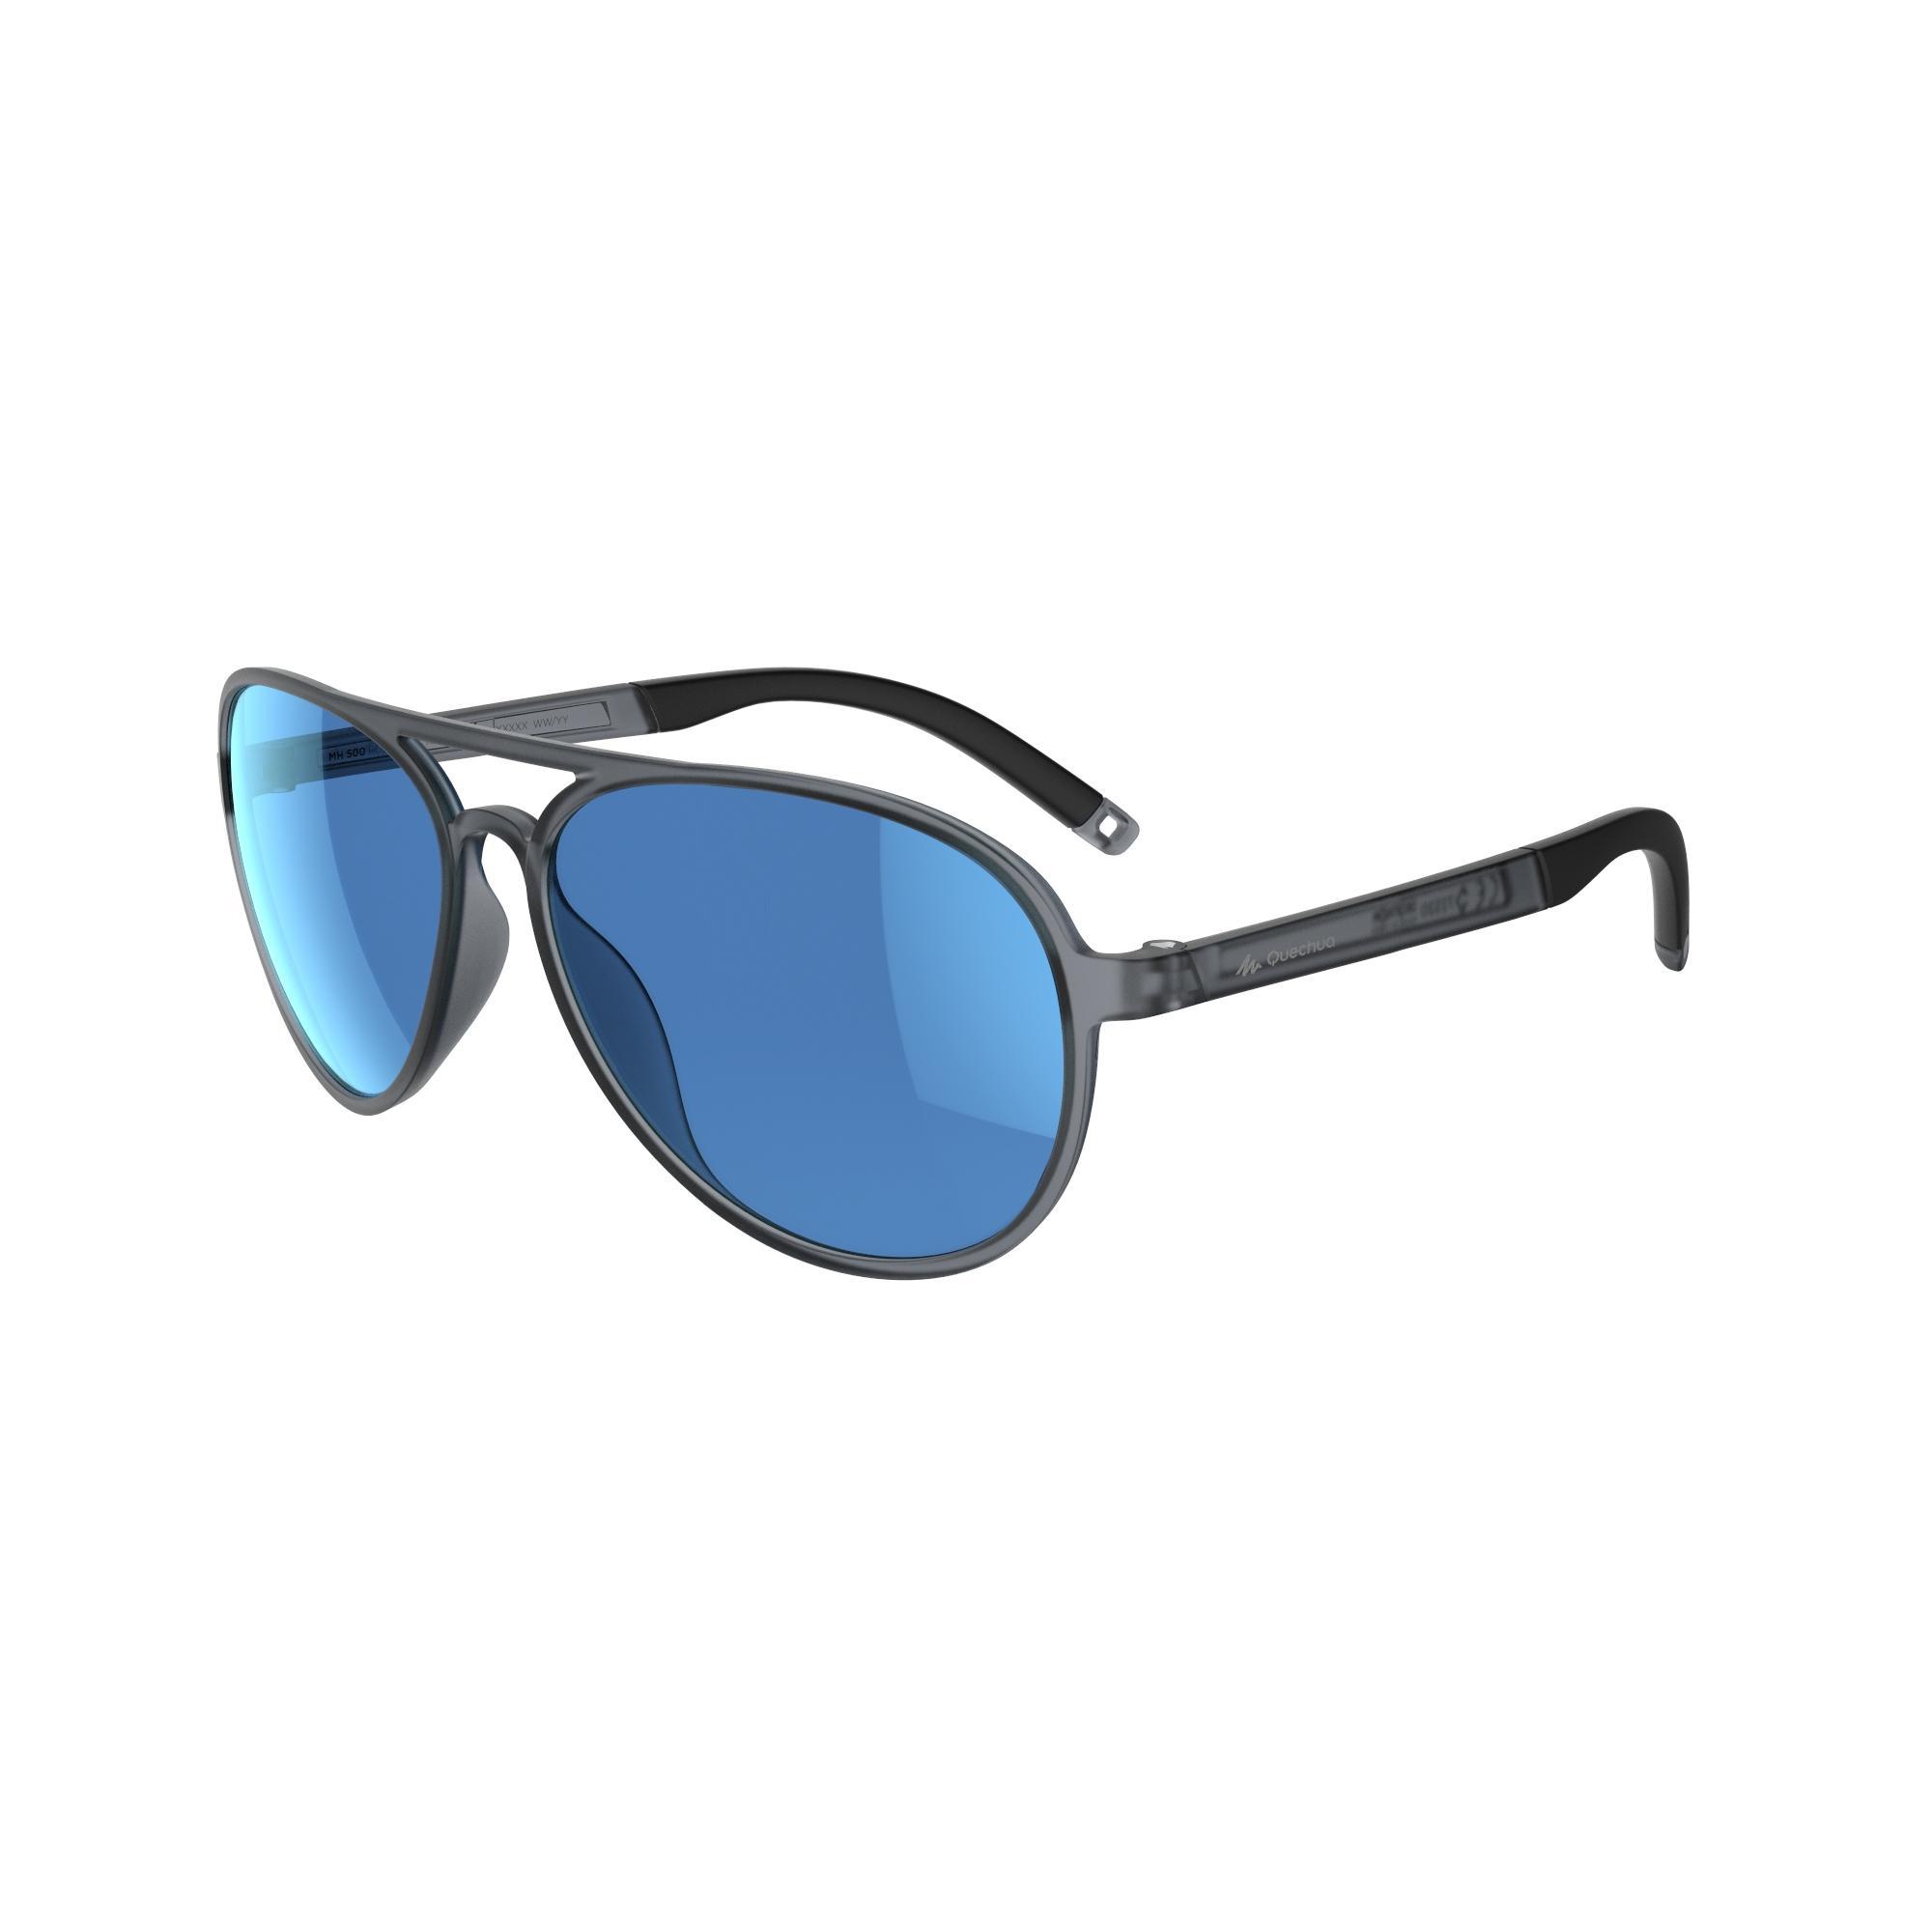 Sunglasses Category 3polarizedBlackamp; Blue Mh500 Hiking H9bD2WYeEI